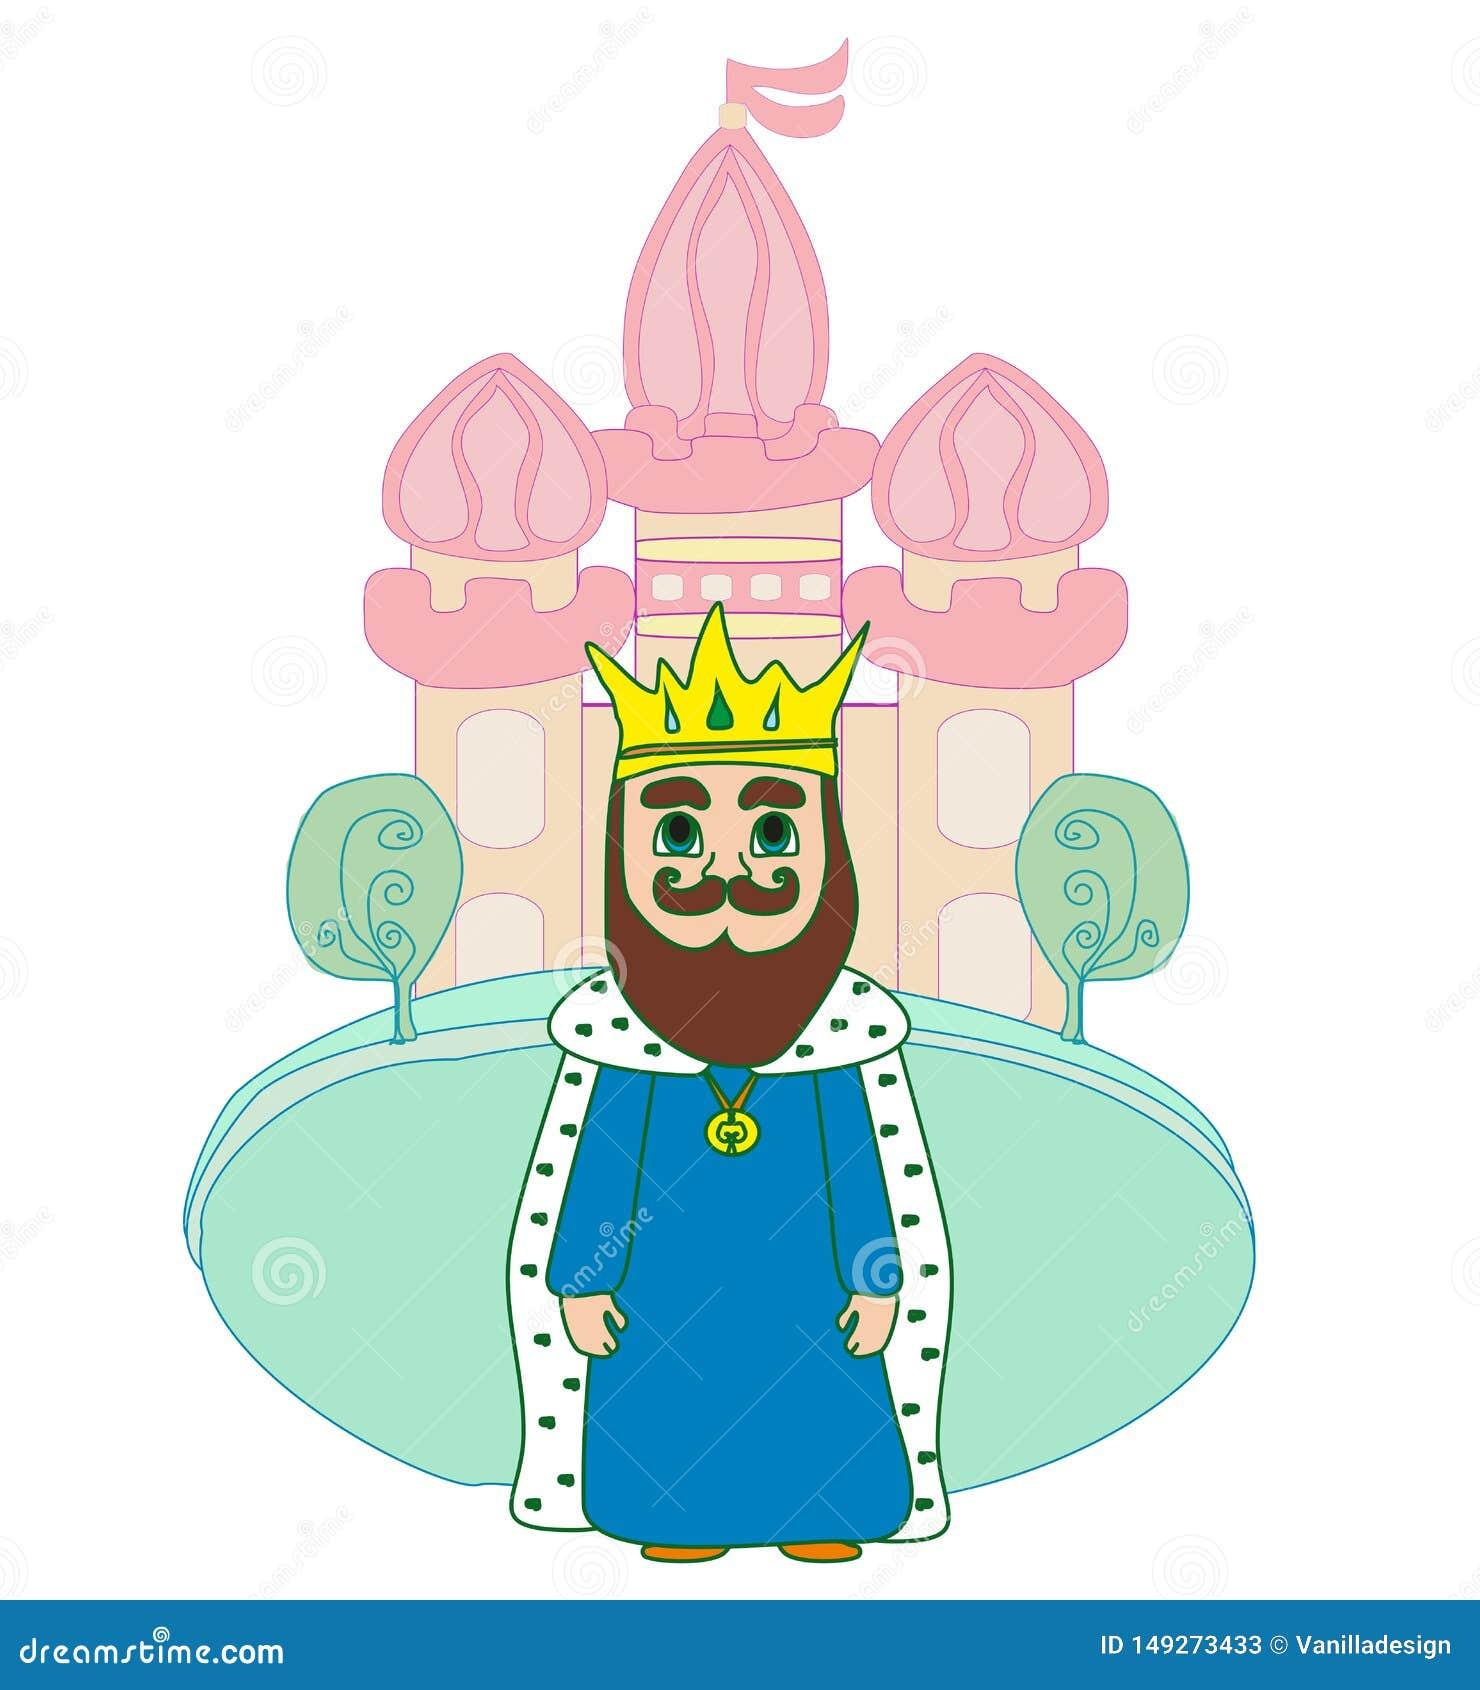 König vor Schloss